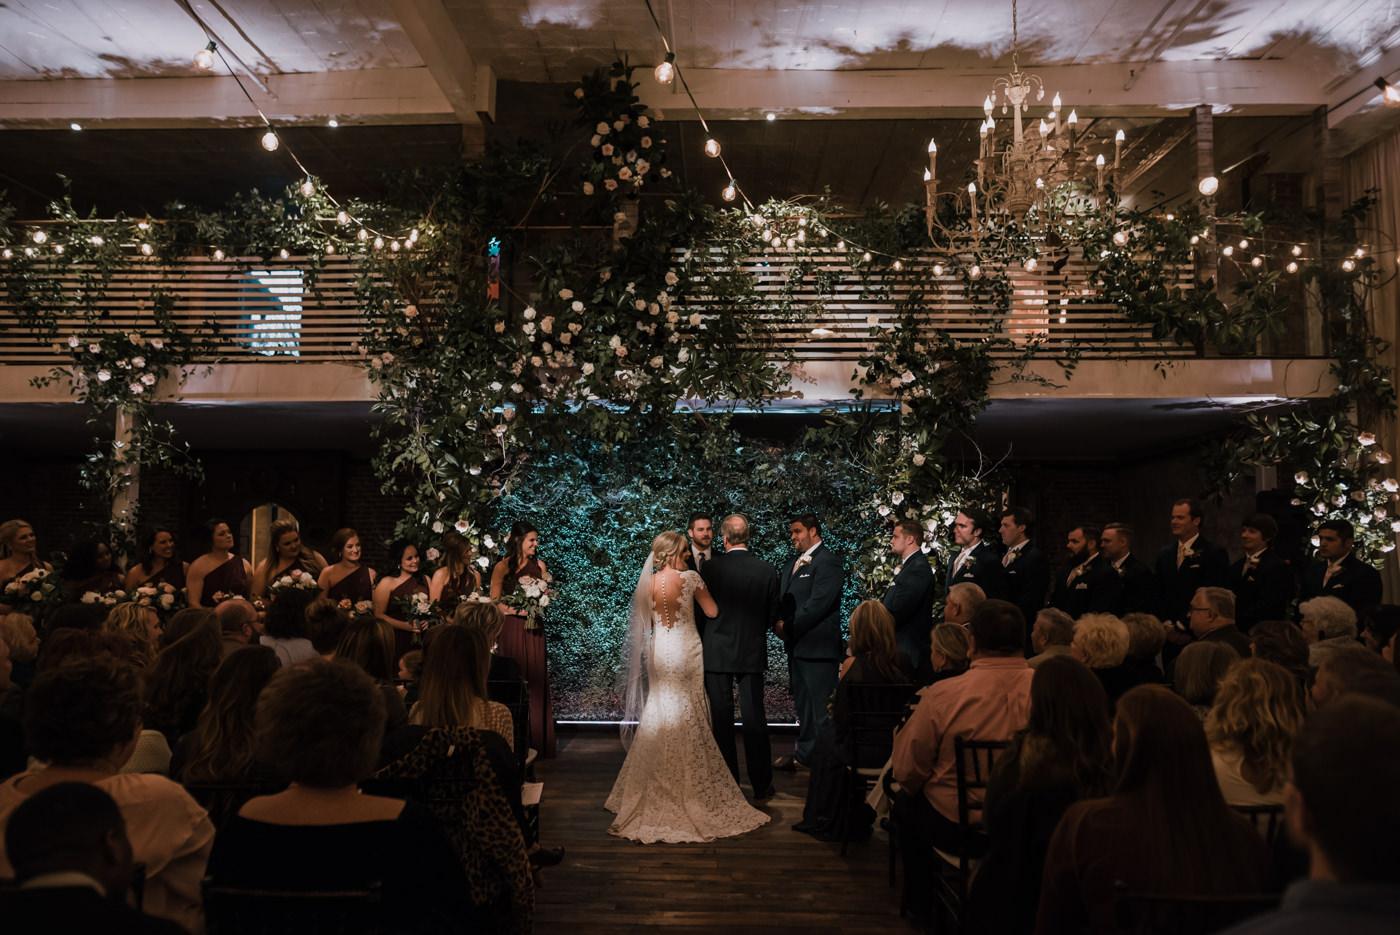 ravington.wedding.northwestarkansas.mileswittboyer-31.jpg